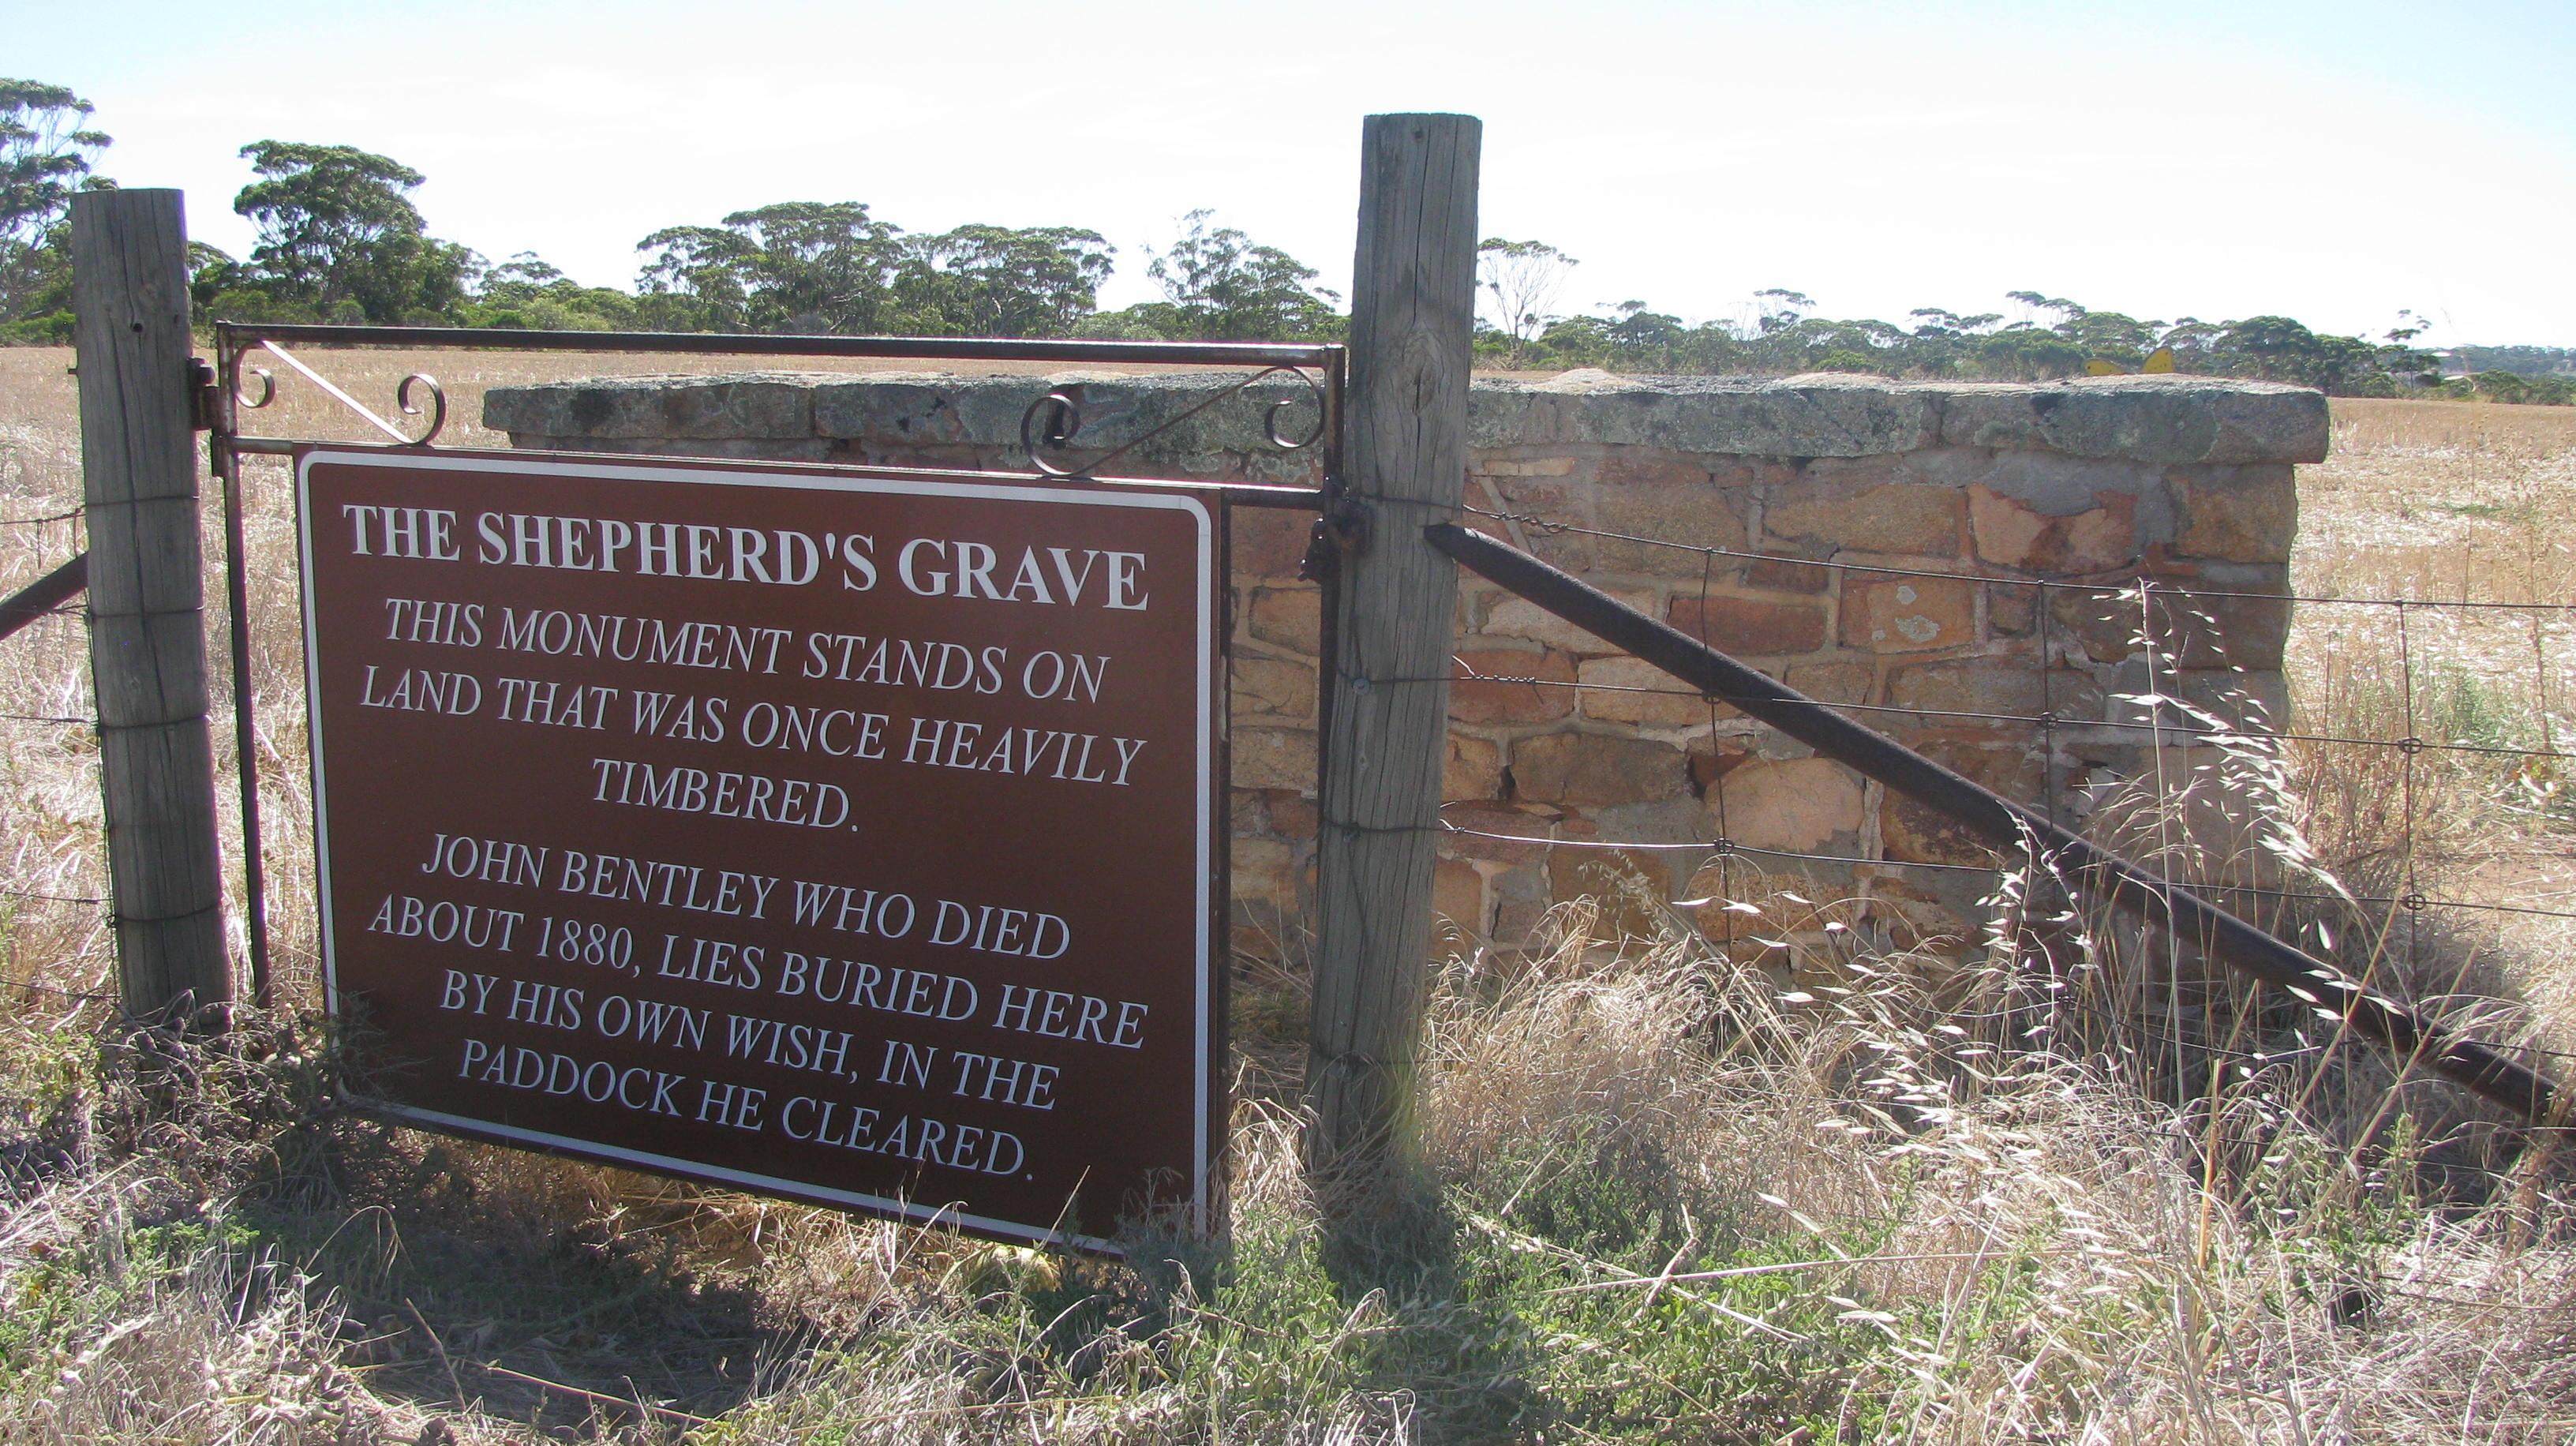 Plaque at the Shepherd's Grave, Goomalling WA